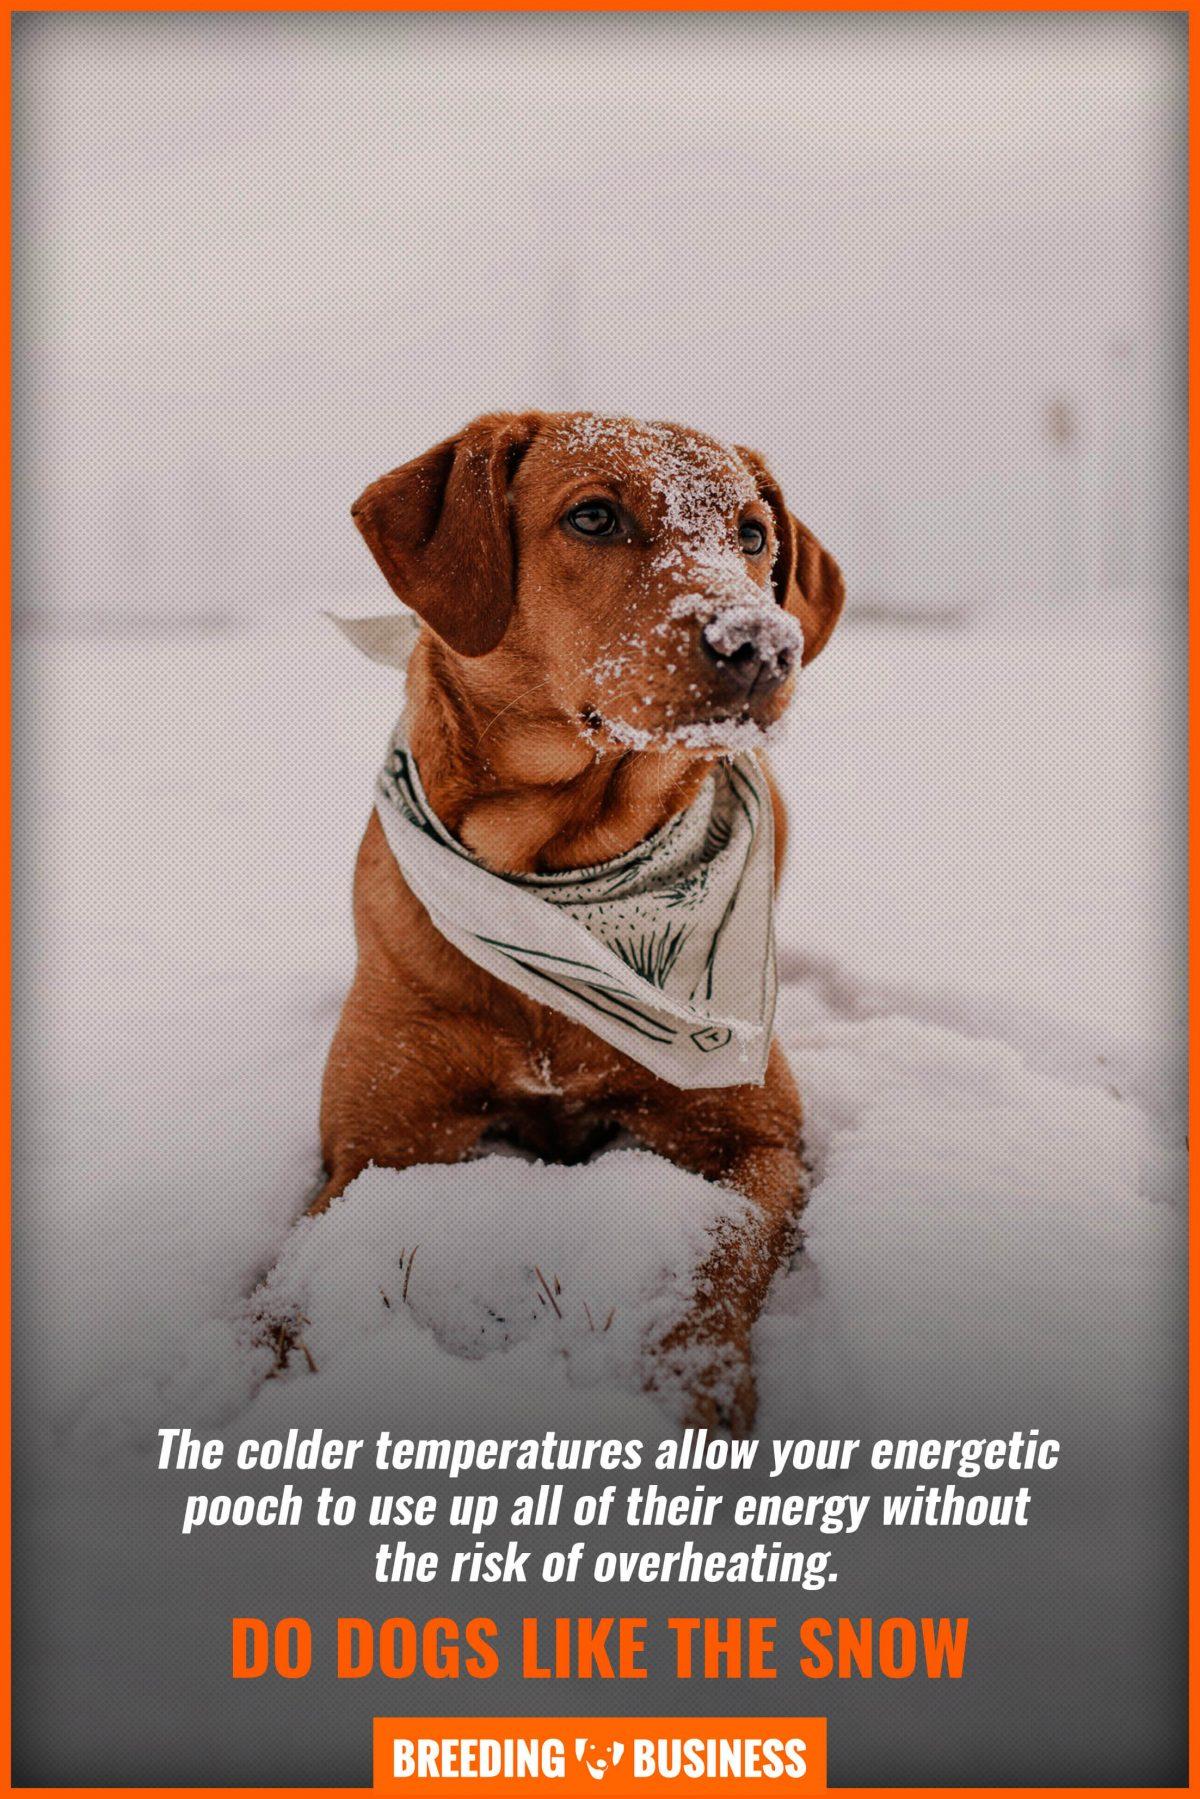 do dogs like the snow